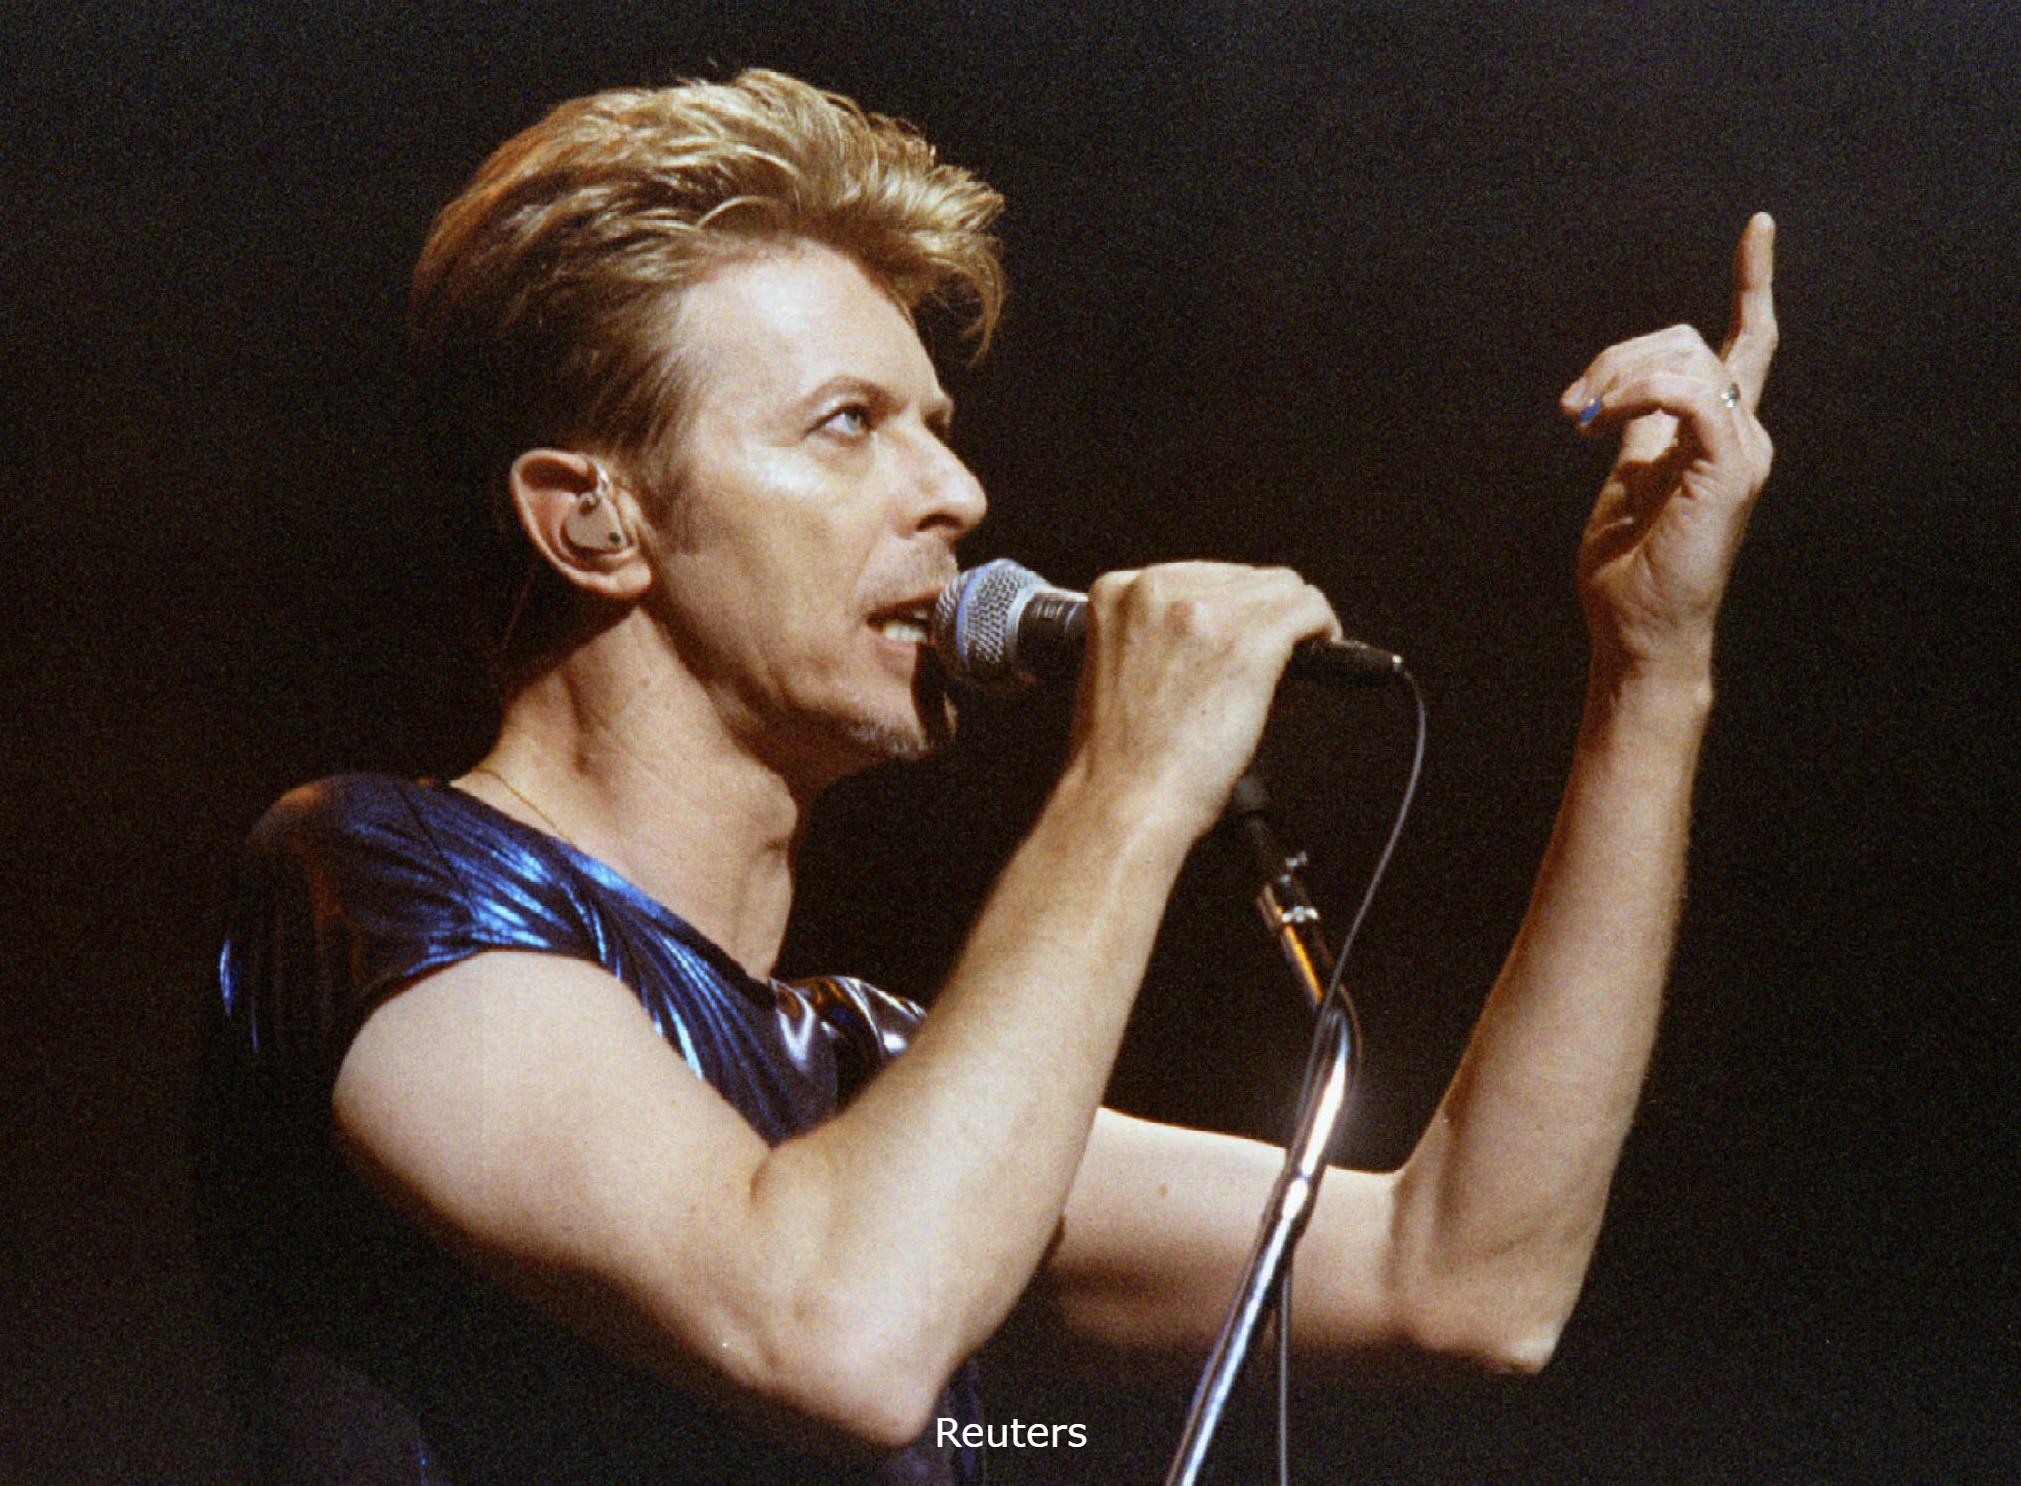 David Bowie RU